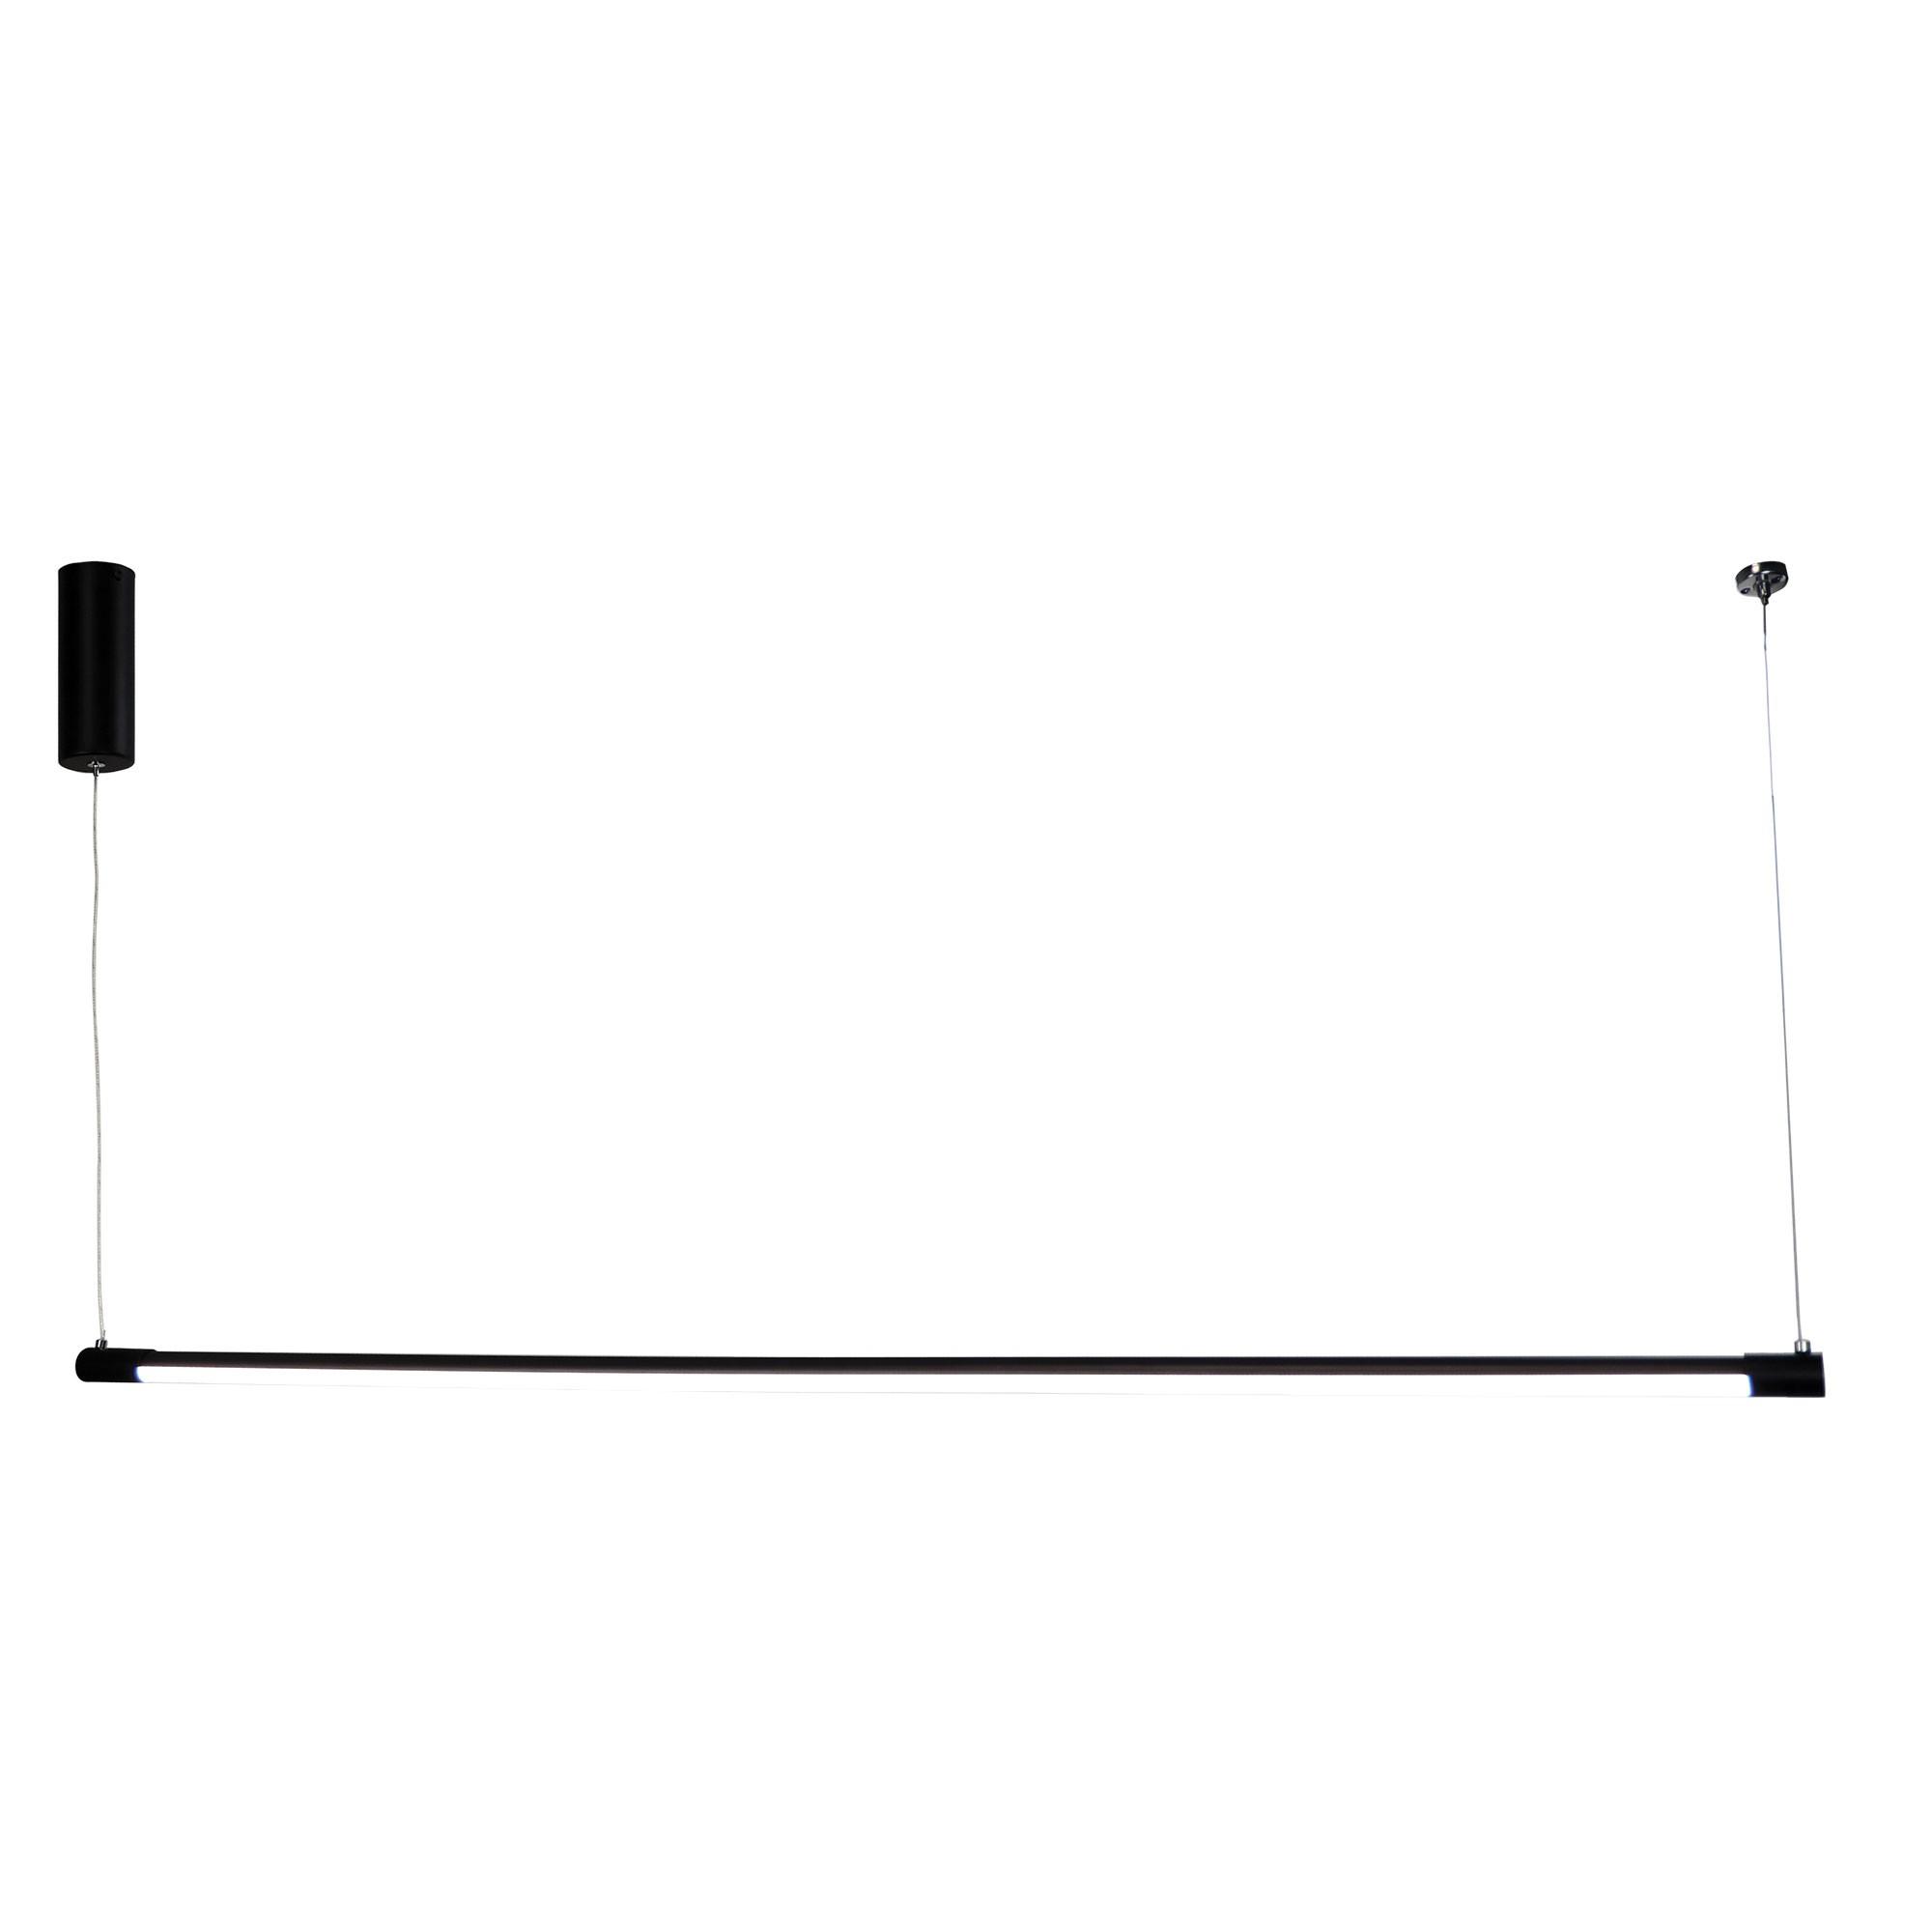 Edge Dimmable LED Linear Pendant Light